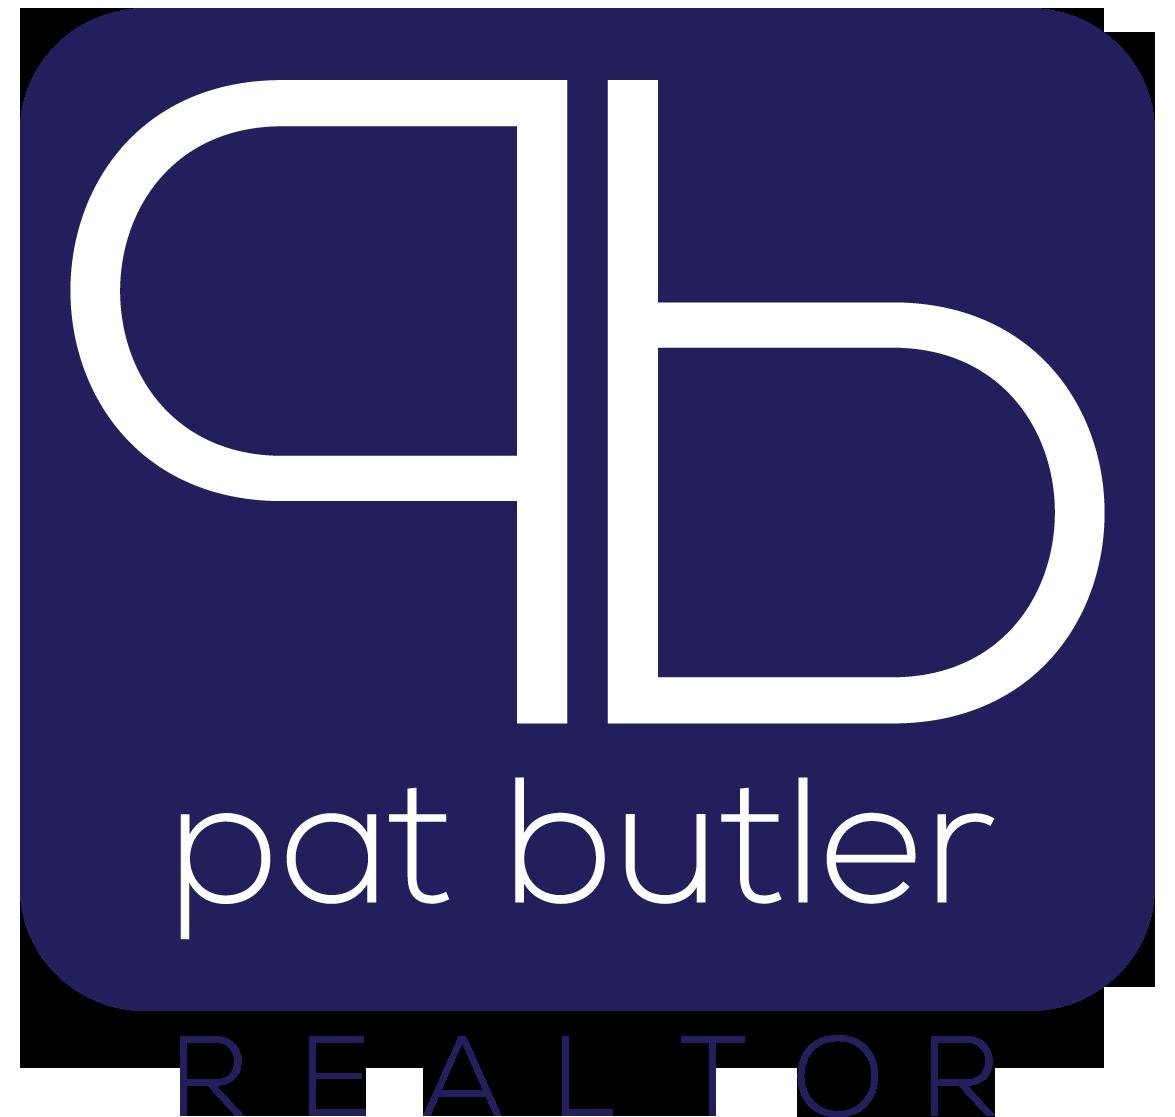 PatButlerRealtorLogo